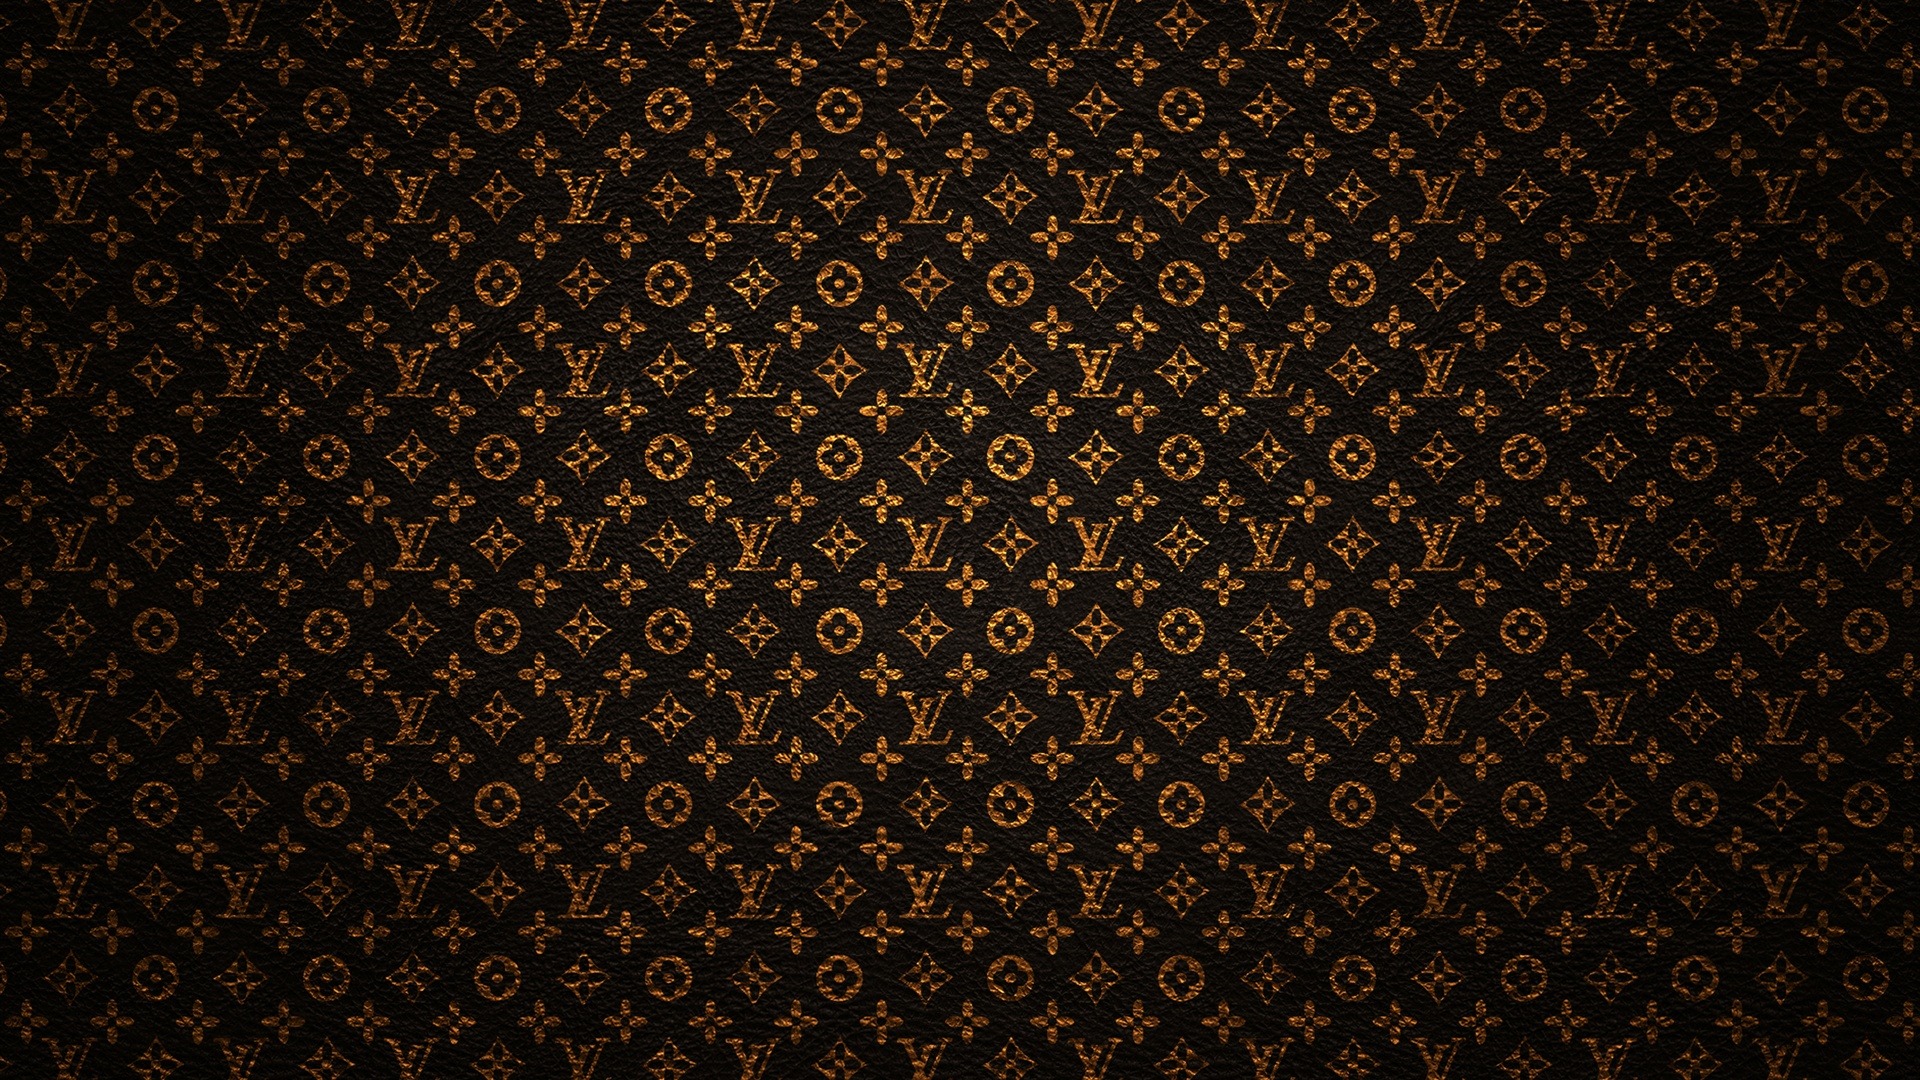 Download Cars Wallpapers For Mobile Versace Wallpapers Hd Pixelstalk Net